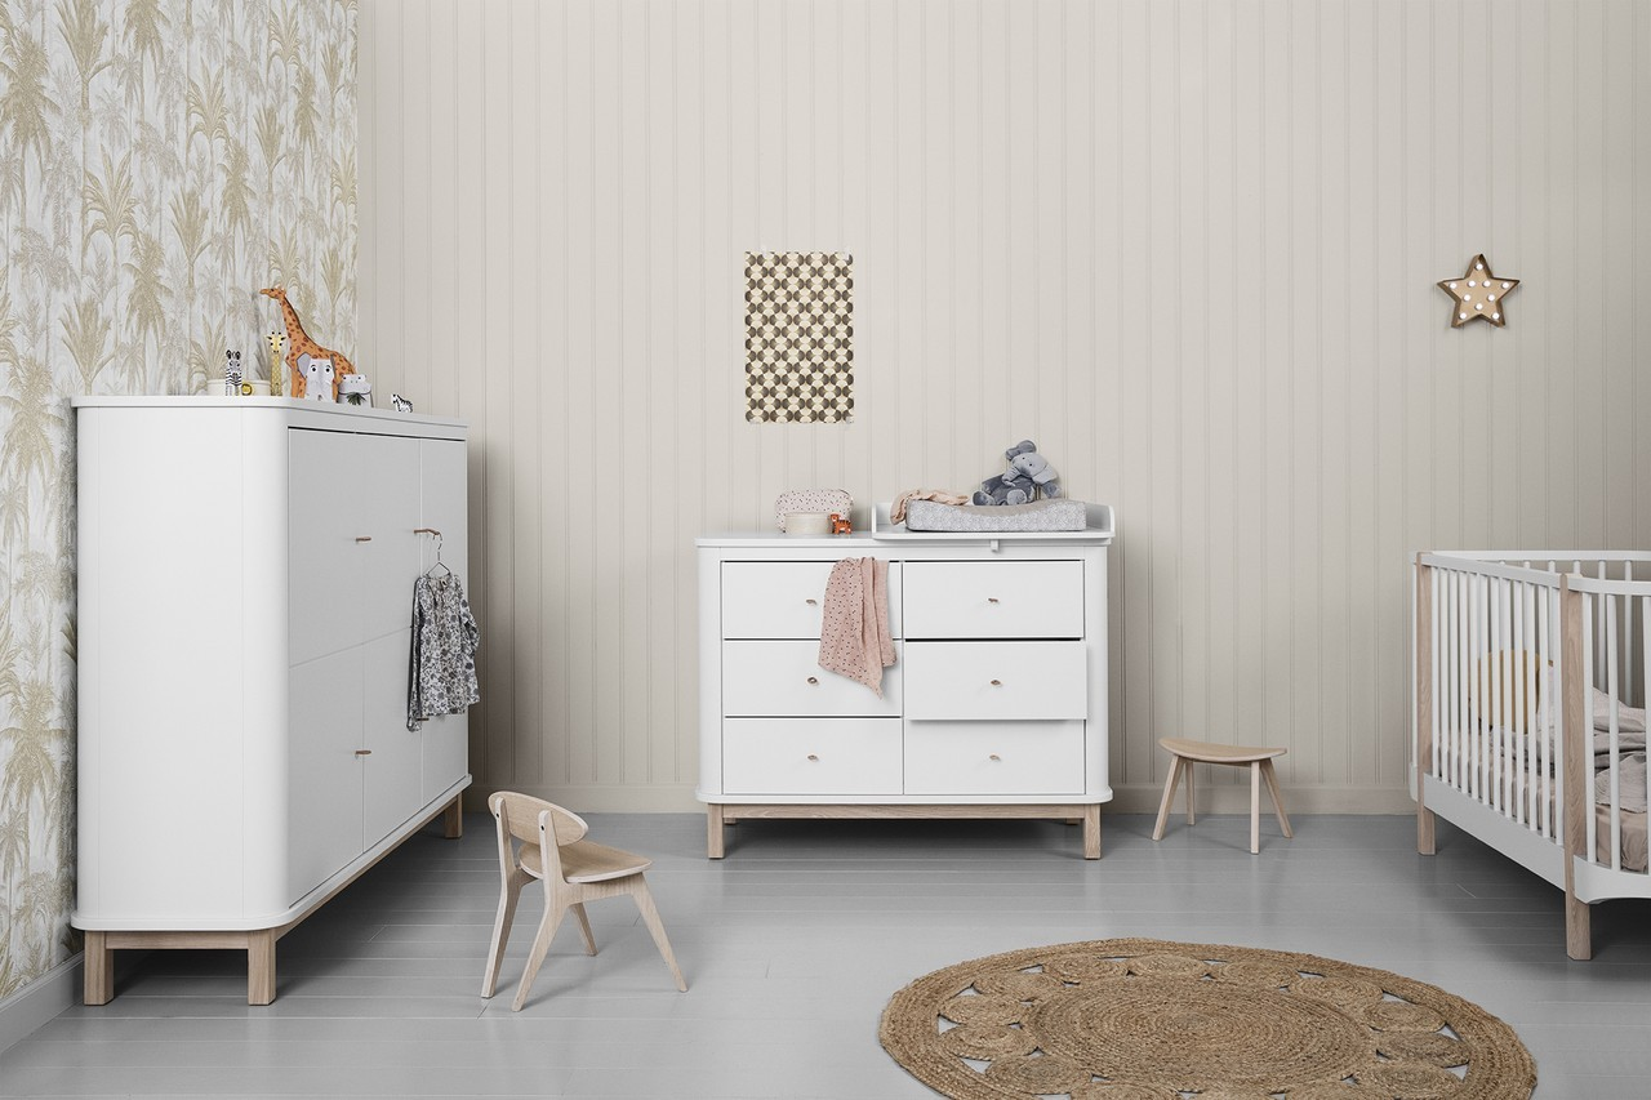 oliver furniture wood wickelplatte klein kleine fabriek. Black Bedroom Furniture Sets. Home Design Ideas